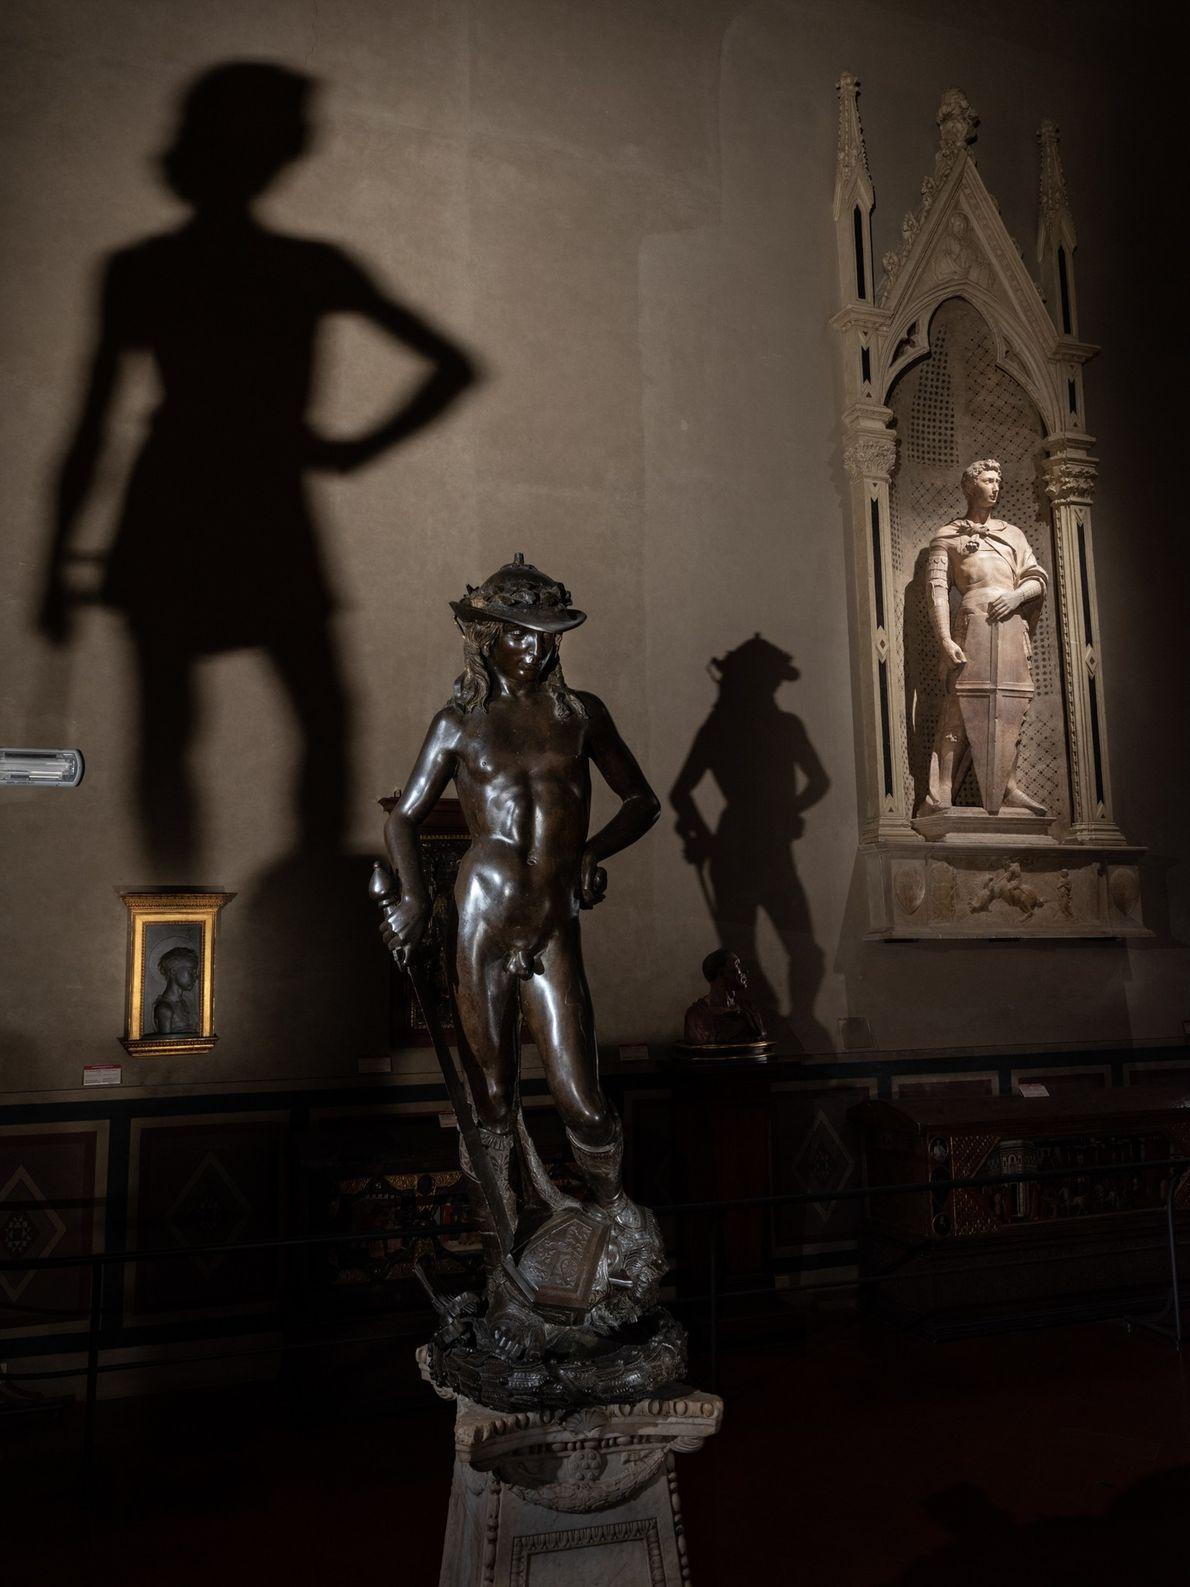 Donatello's David (1440) stands sentinel in Florence's Bargello Museum.